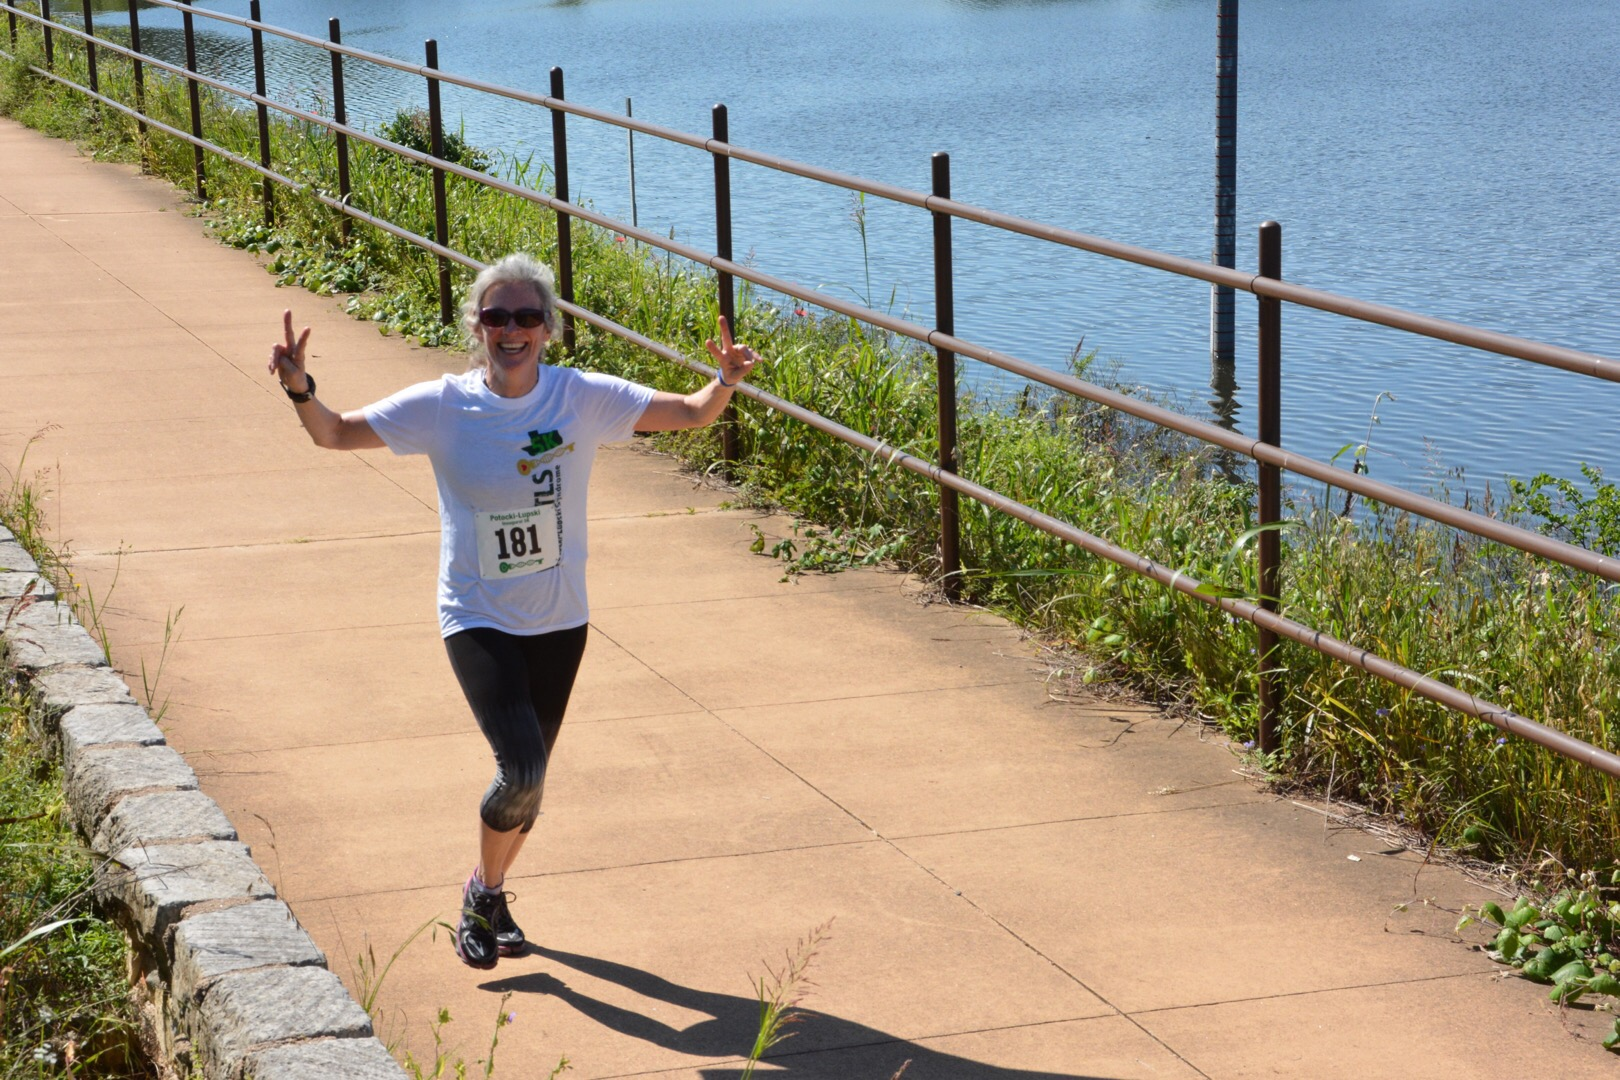 Dr Potoki running a 5k